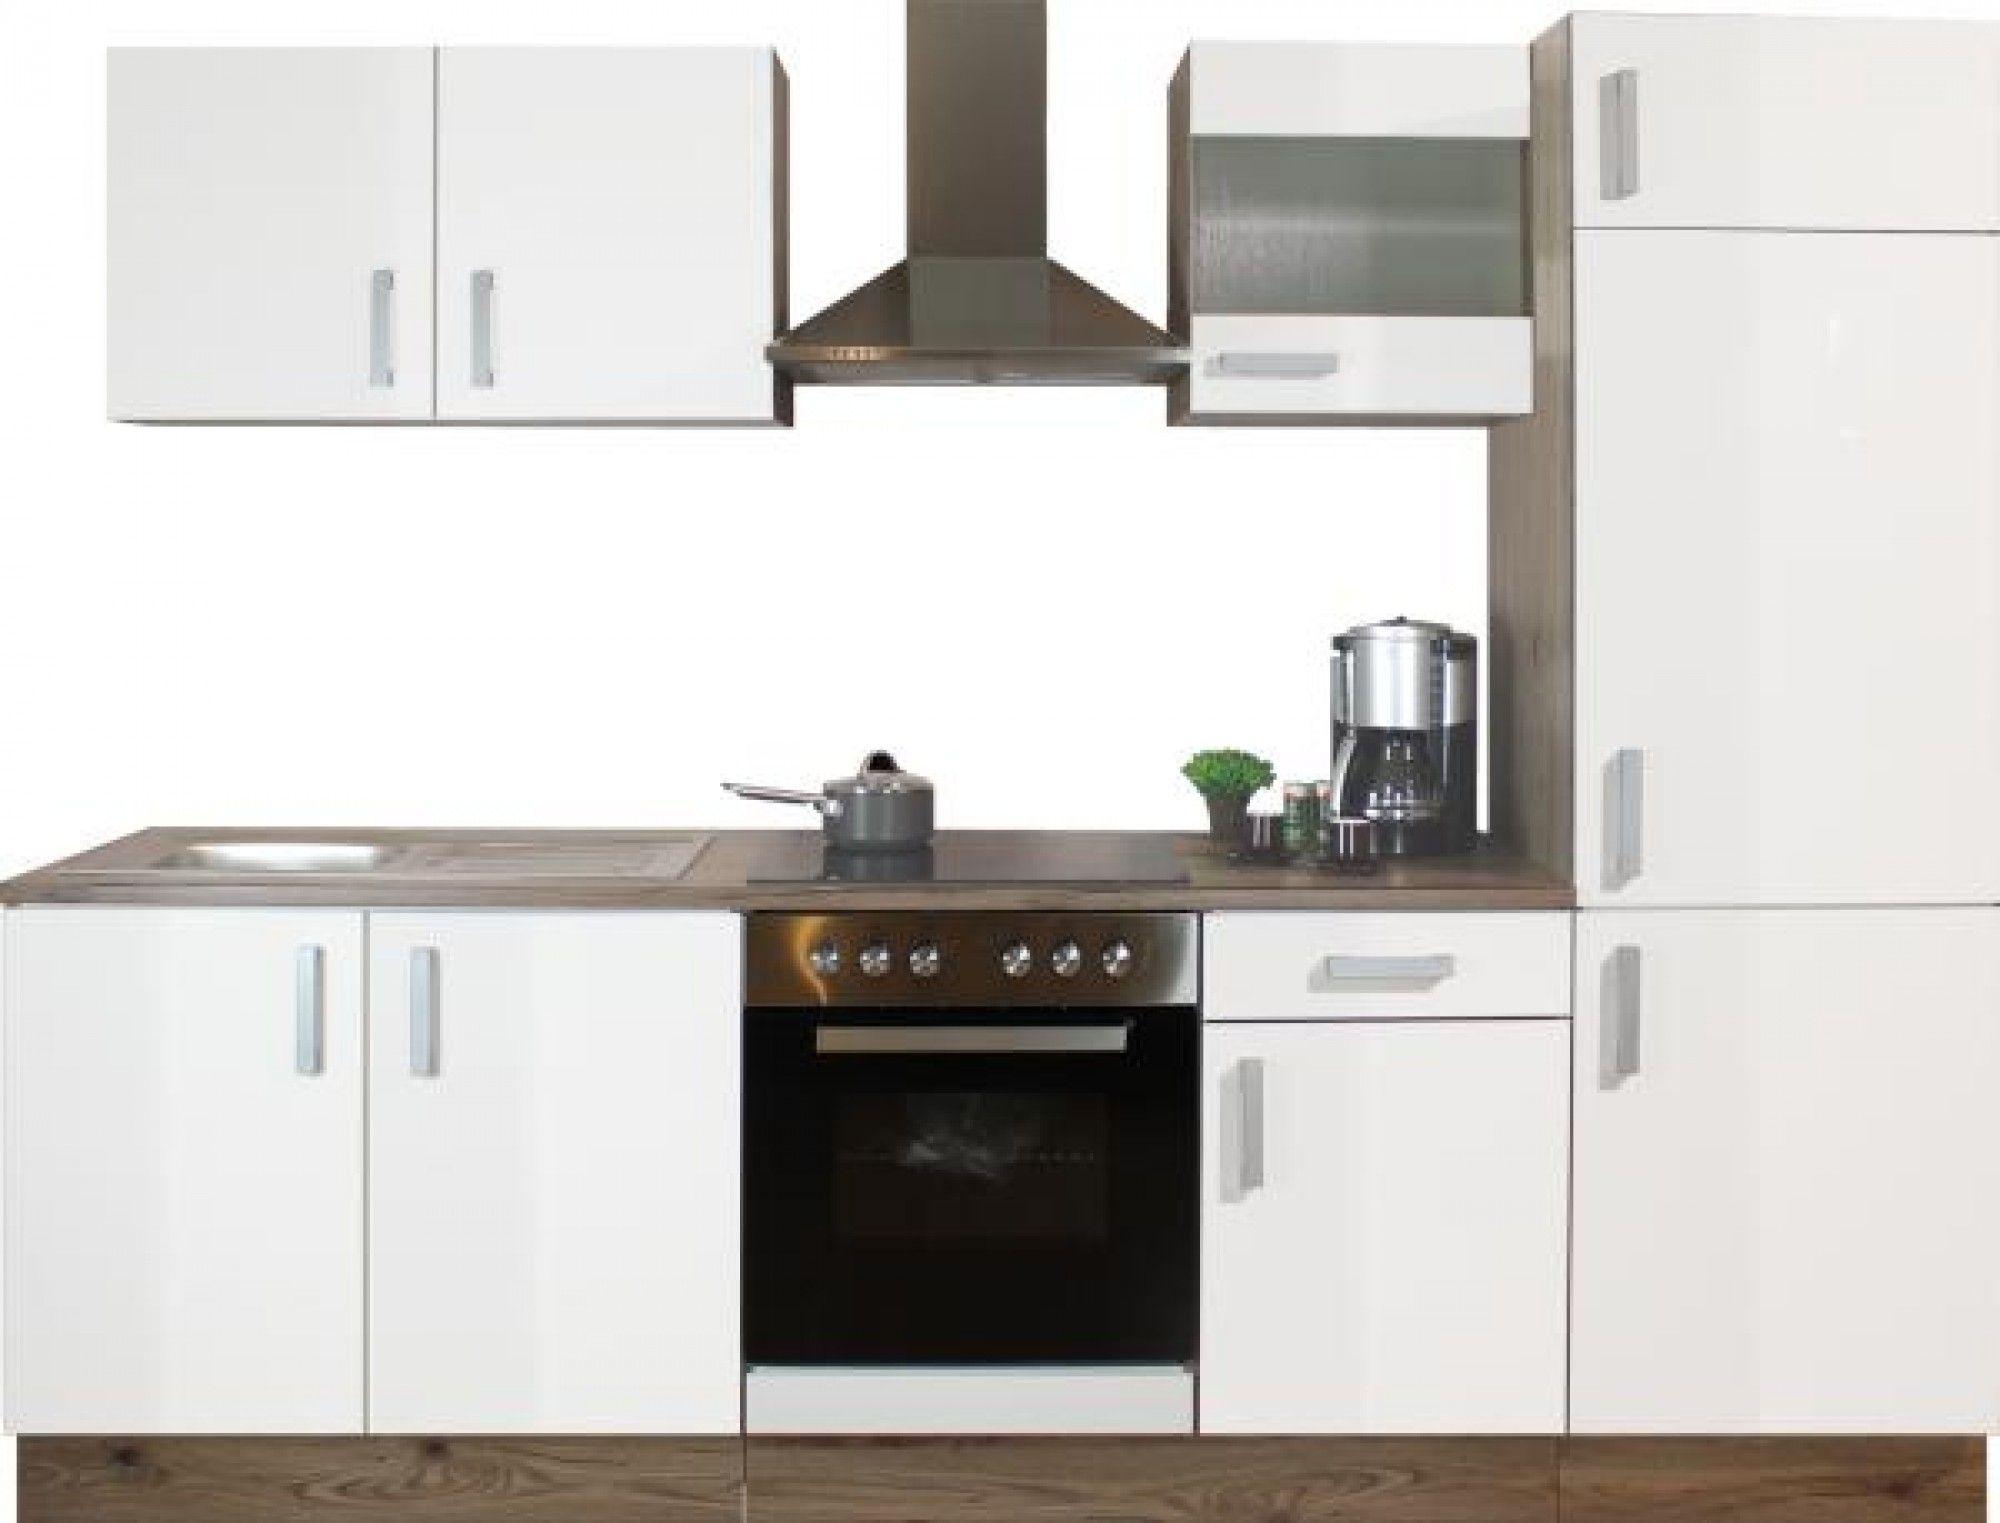 Poco Küchen Ohne E Geräte   Küche Inklusive E Geräte Küche Mit E ...